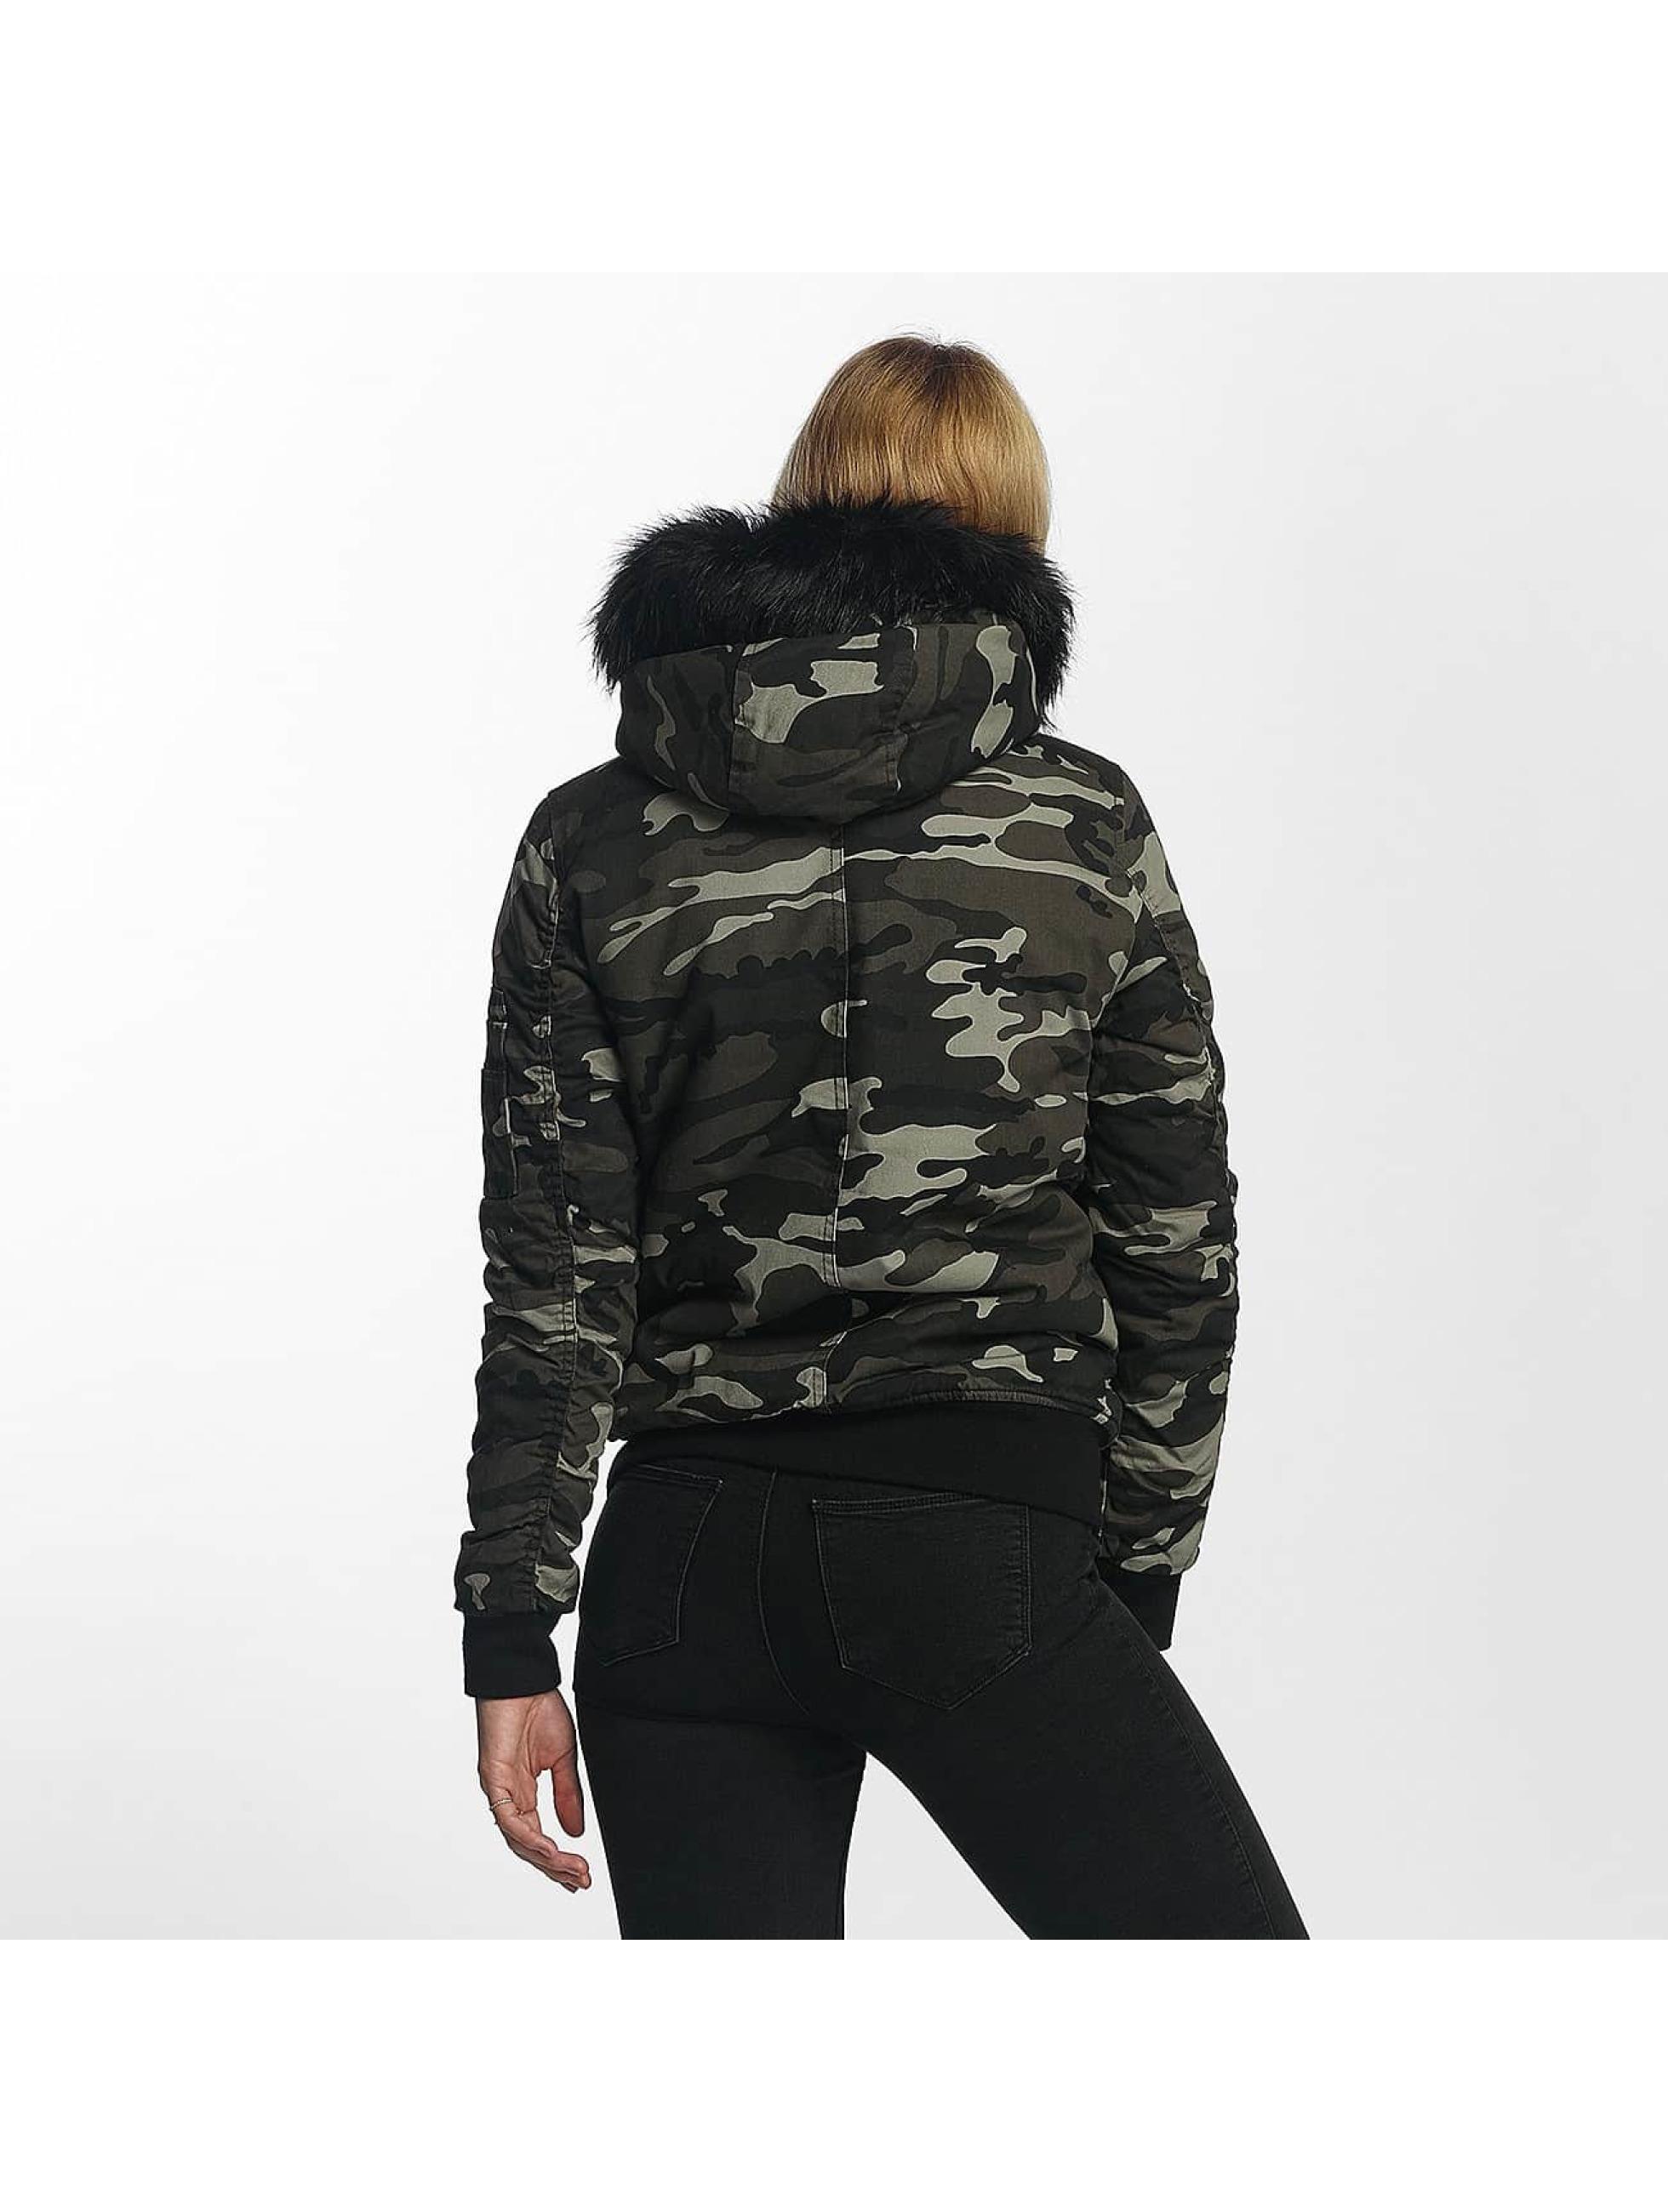 def damen winterjacke bomber in camouflage 351938. Black Bedroom Furniture Sets. Home Design Ideas